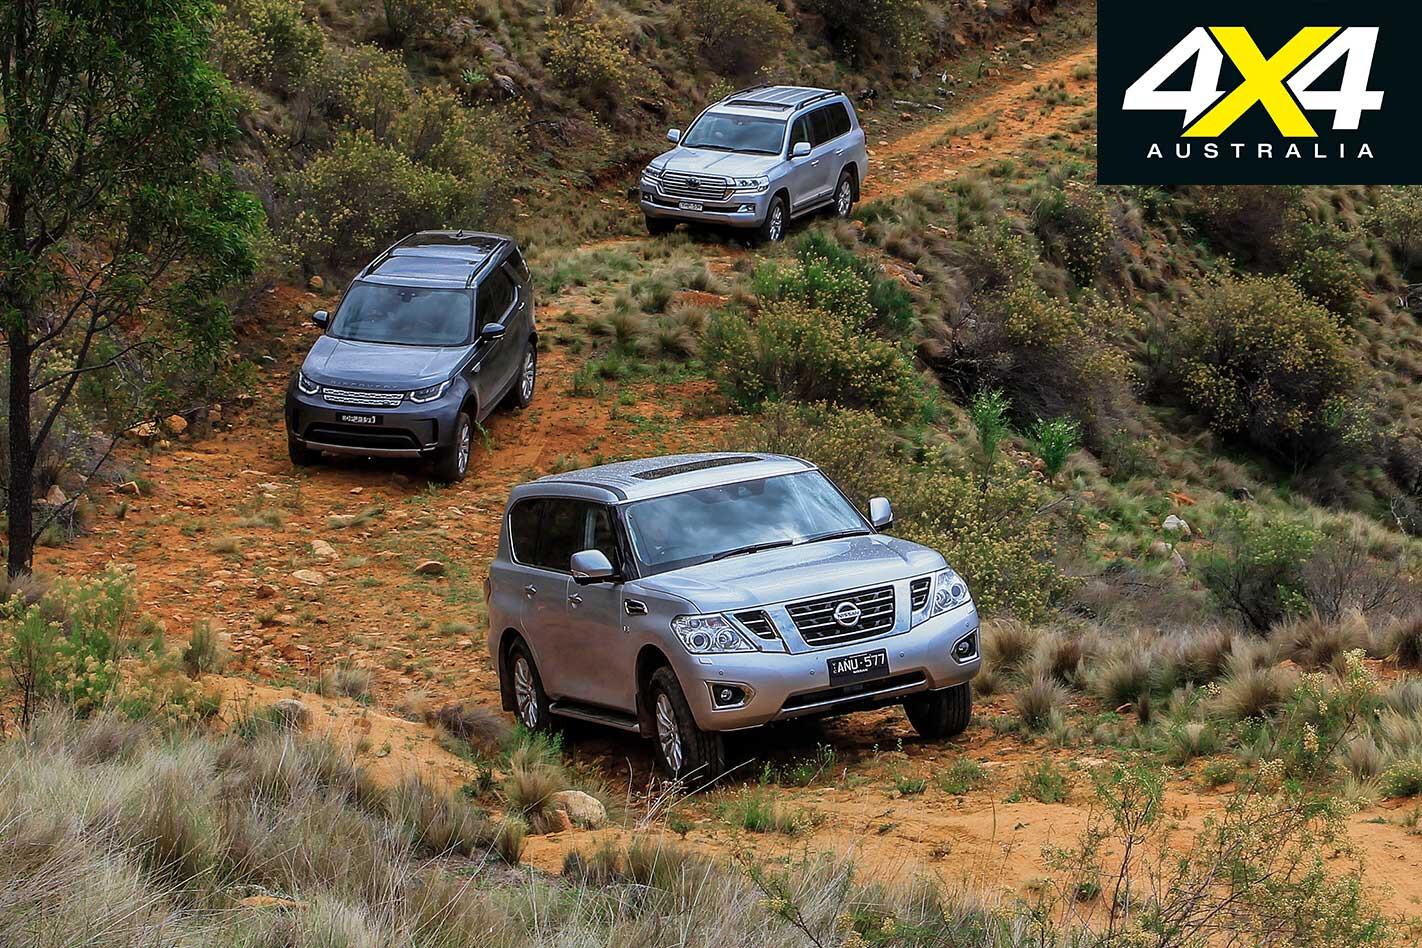 2018 Nissan Patrol Vs Land Rover Discovery Vs Toyota Land Cruiser 200 Series Comparison Jpg